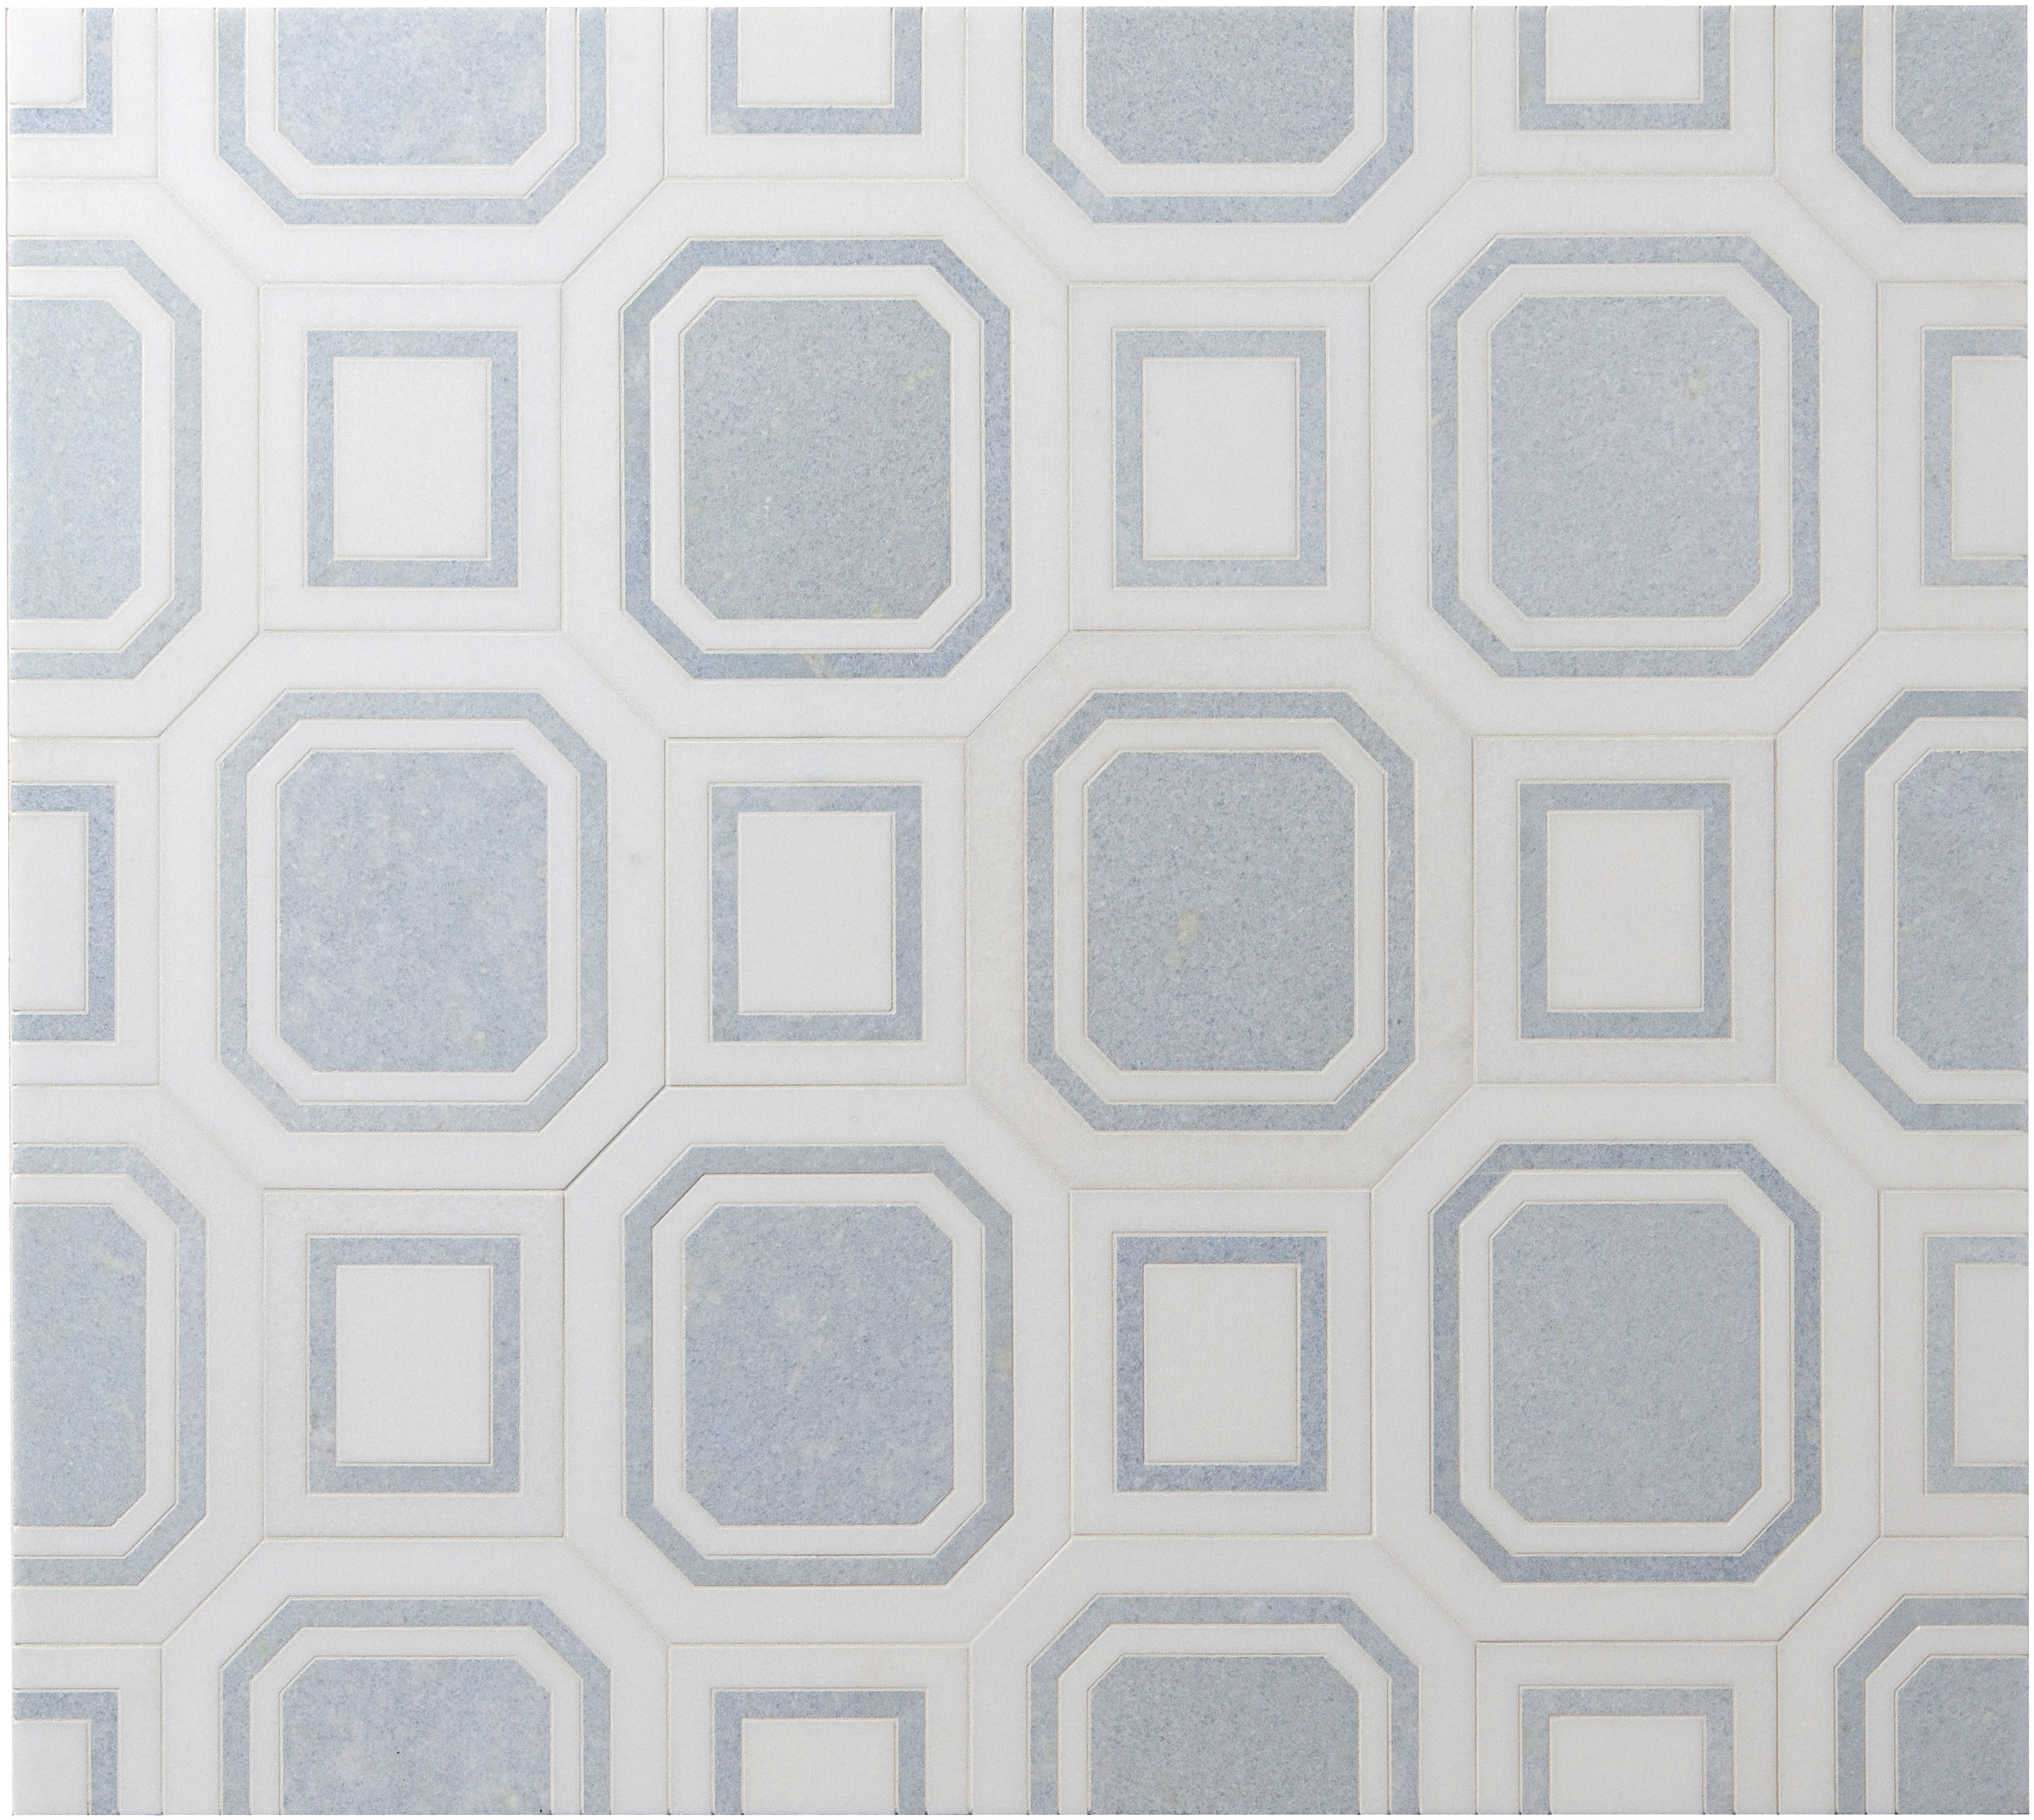 Scale Moderne Design.Interior Designer Michael Berman And Walker Zanger Debut New